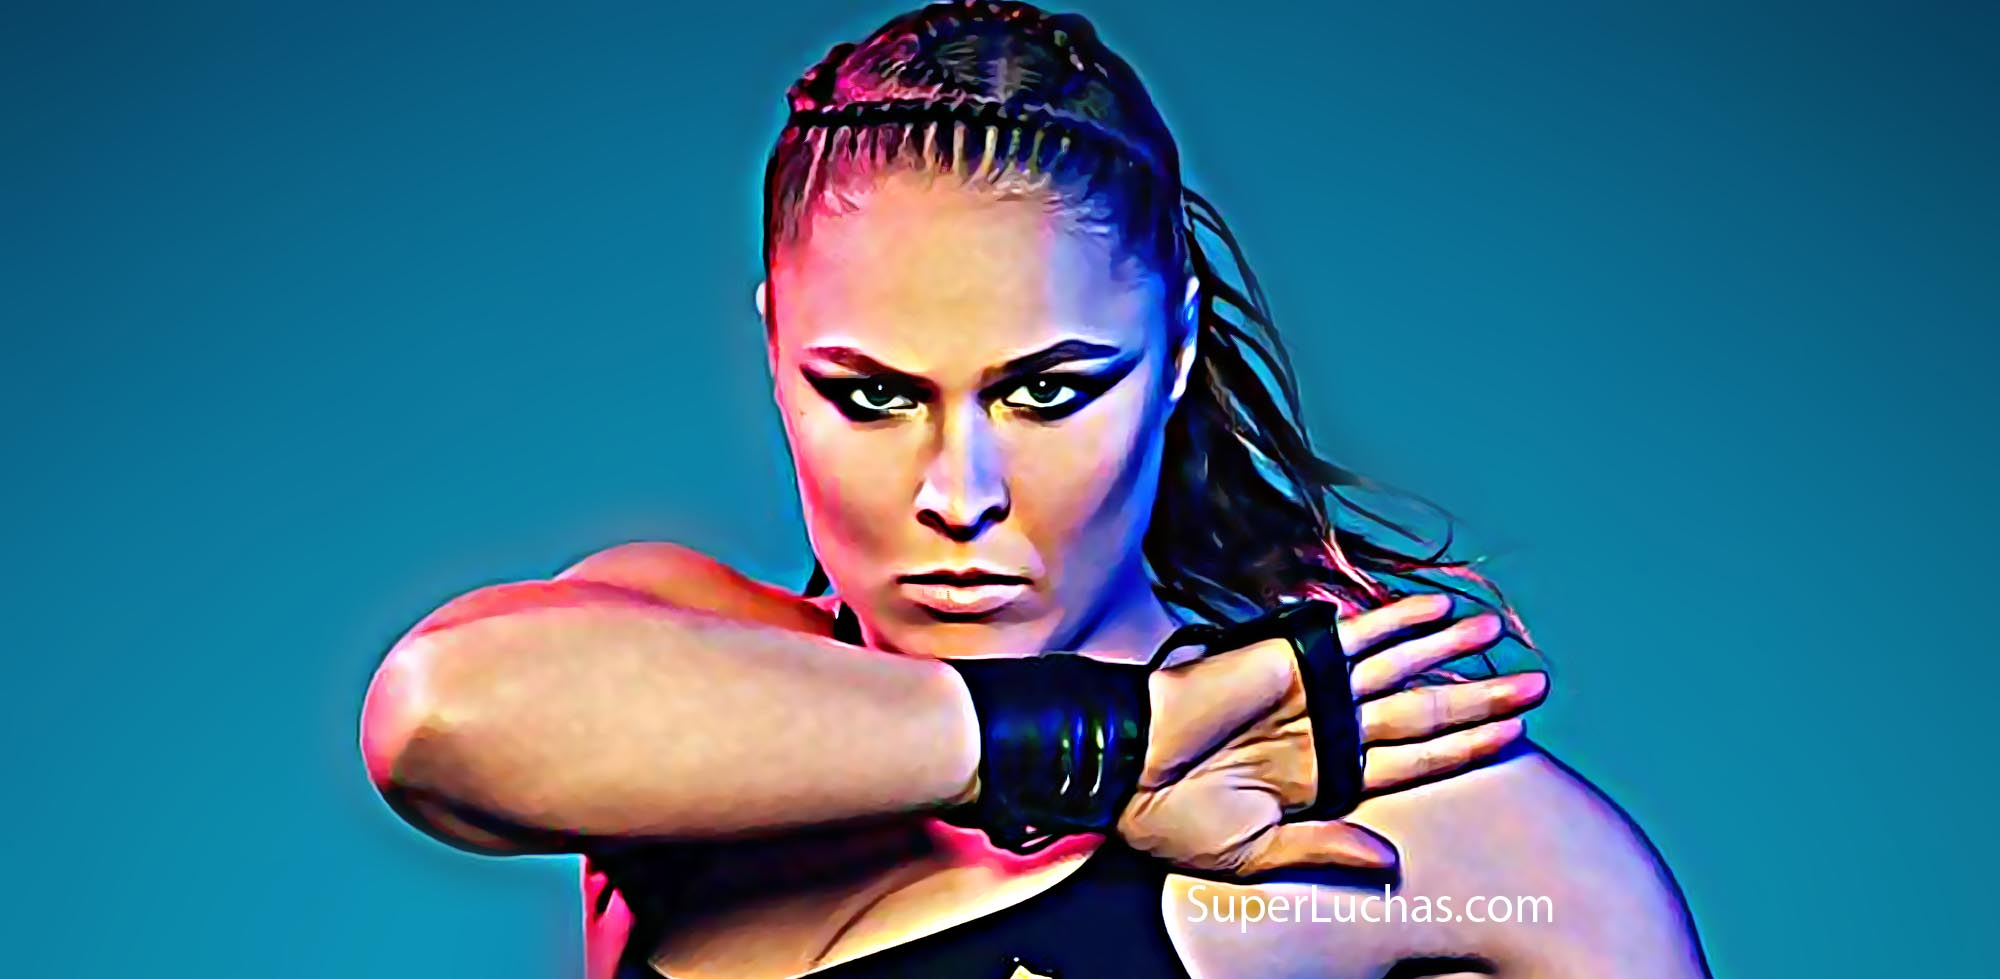 Ronda Rousey / UFC - WWE